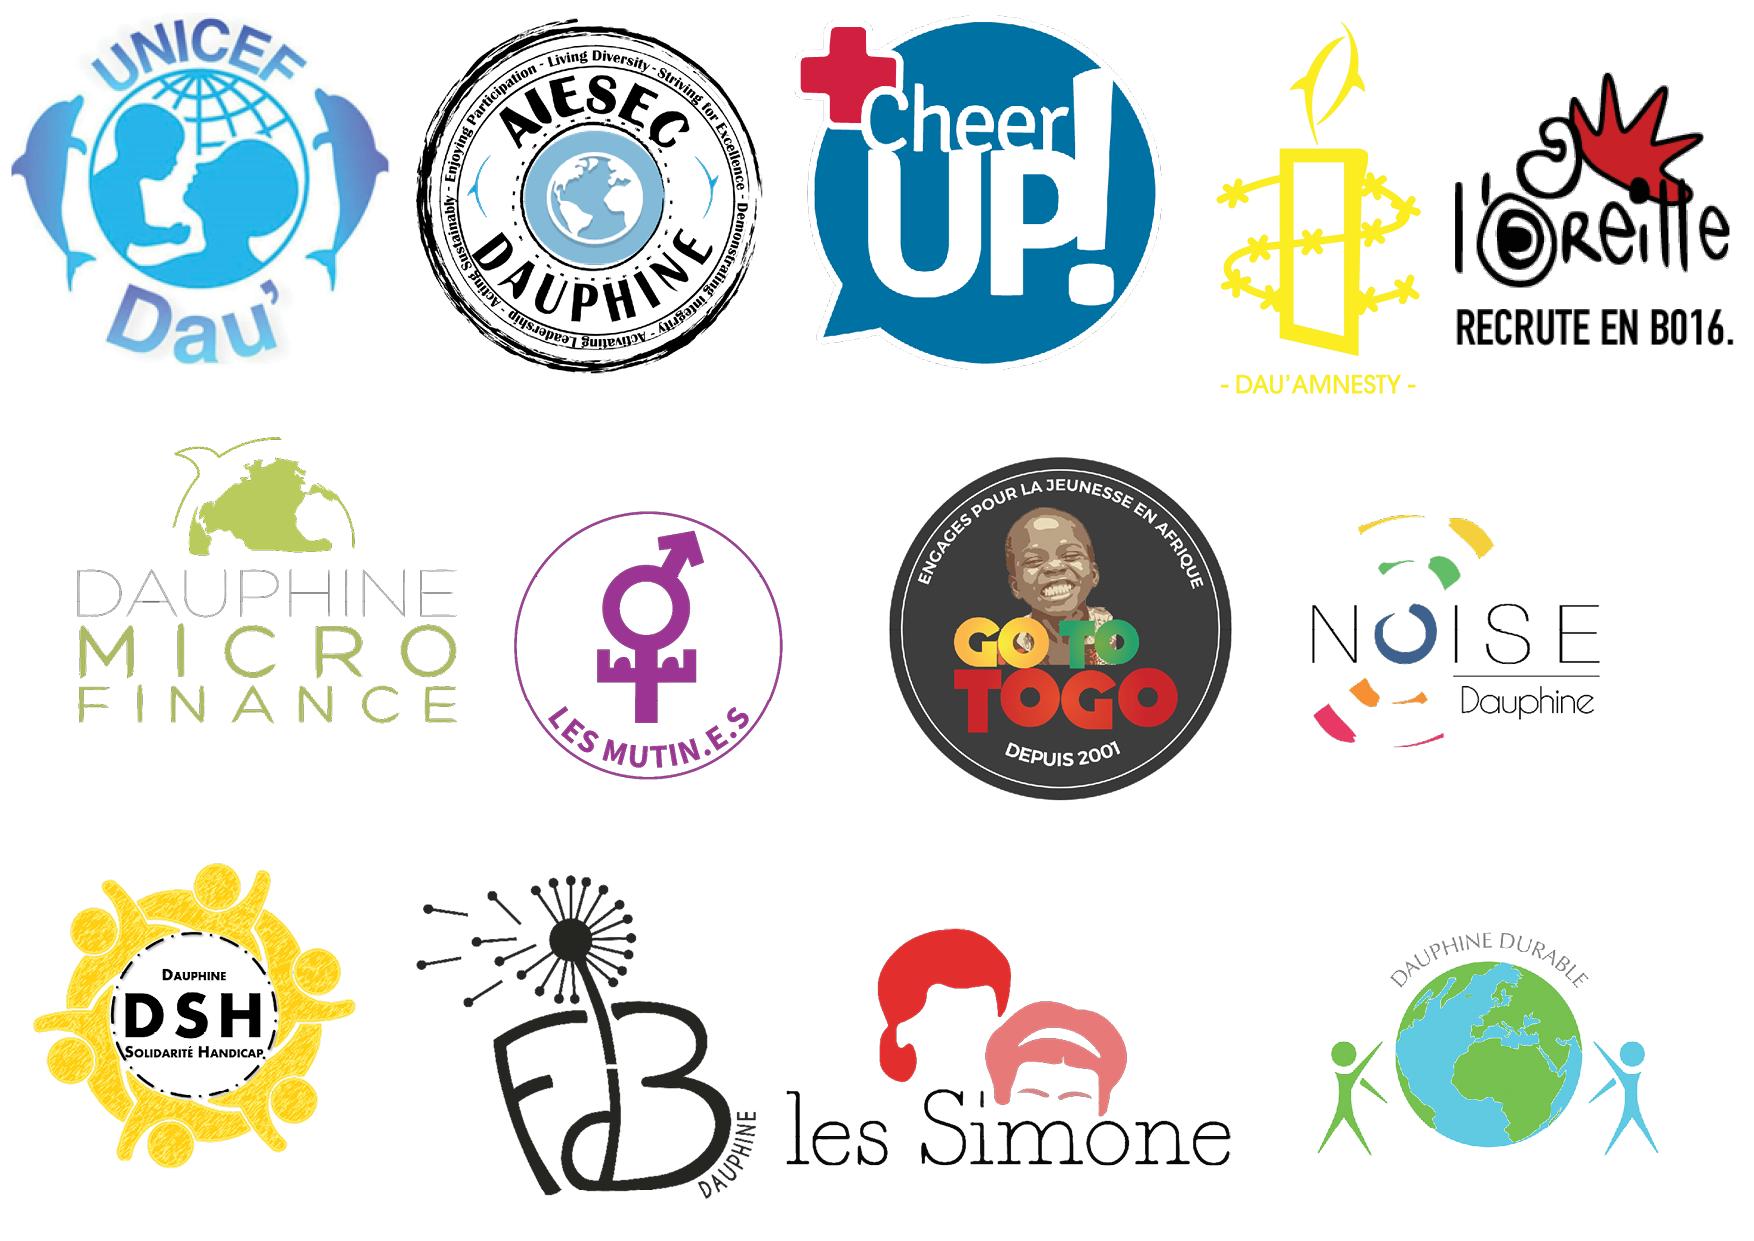 Le guide des associations solidaires Dauphinoises